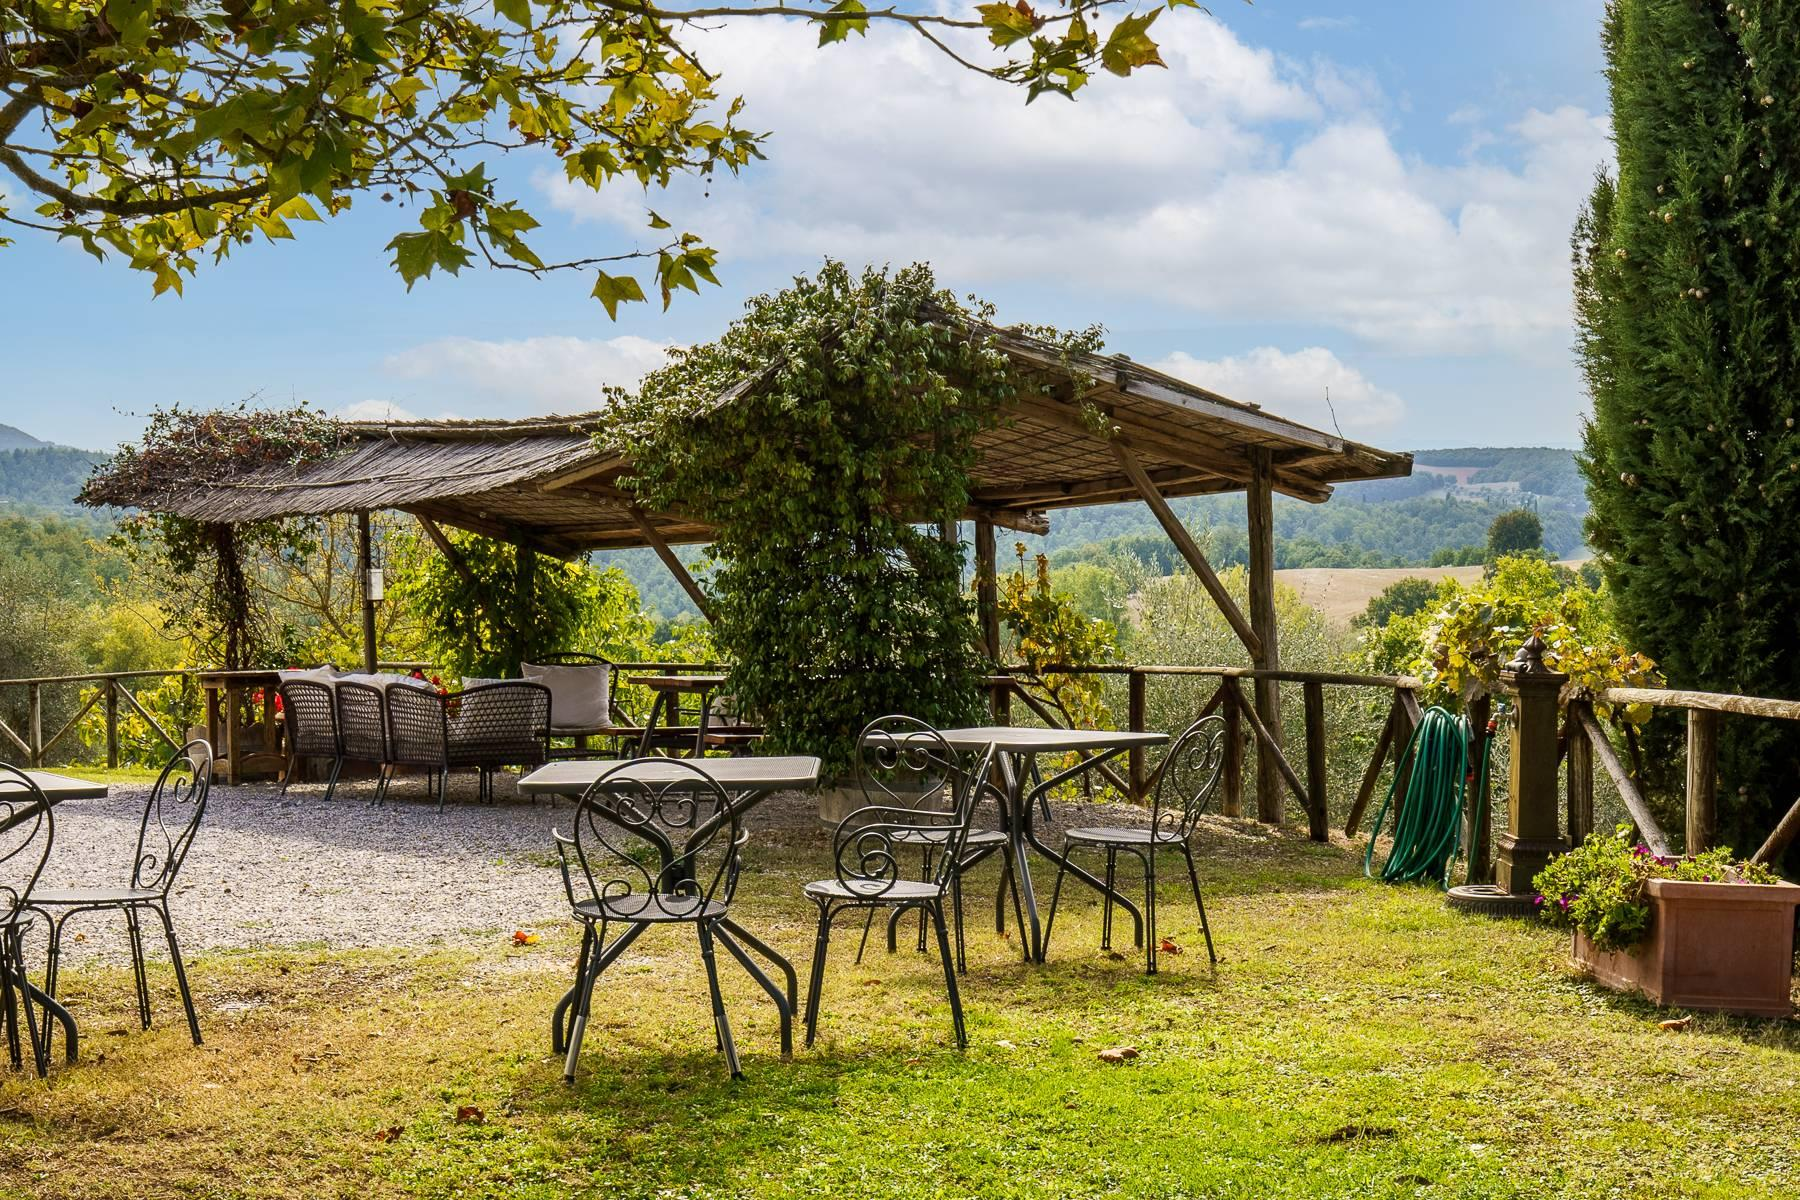 Organic winery in the heart of Crete Senesi - 4